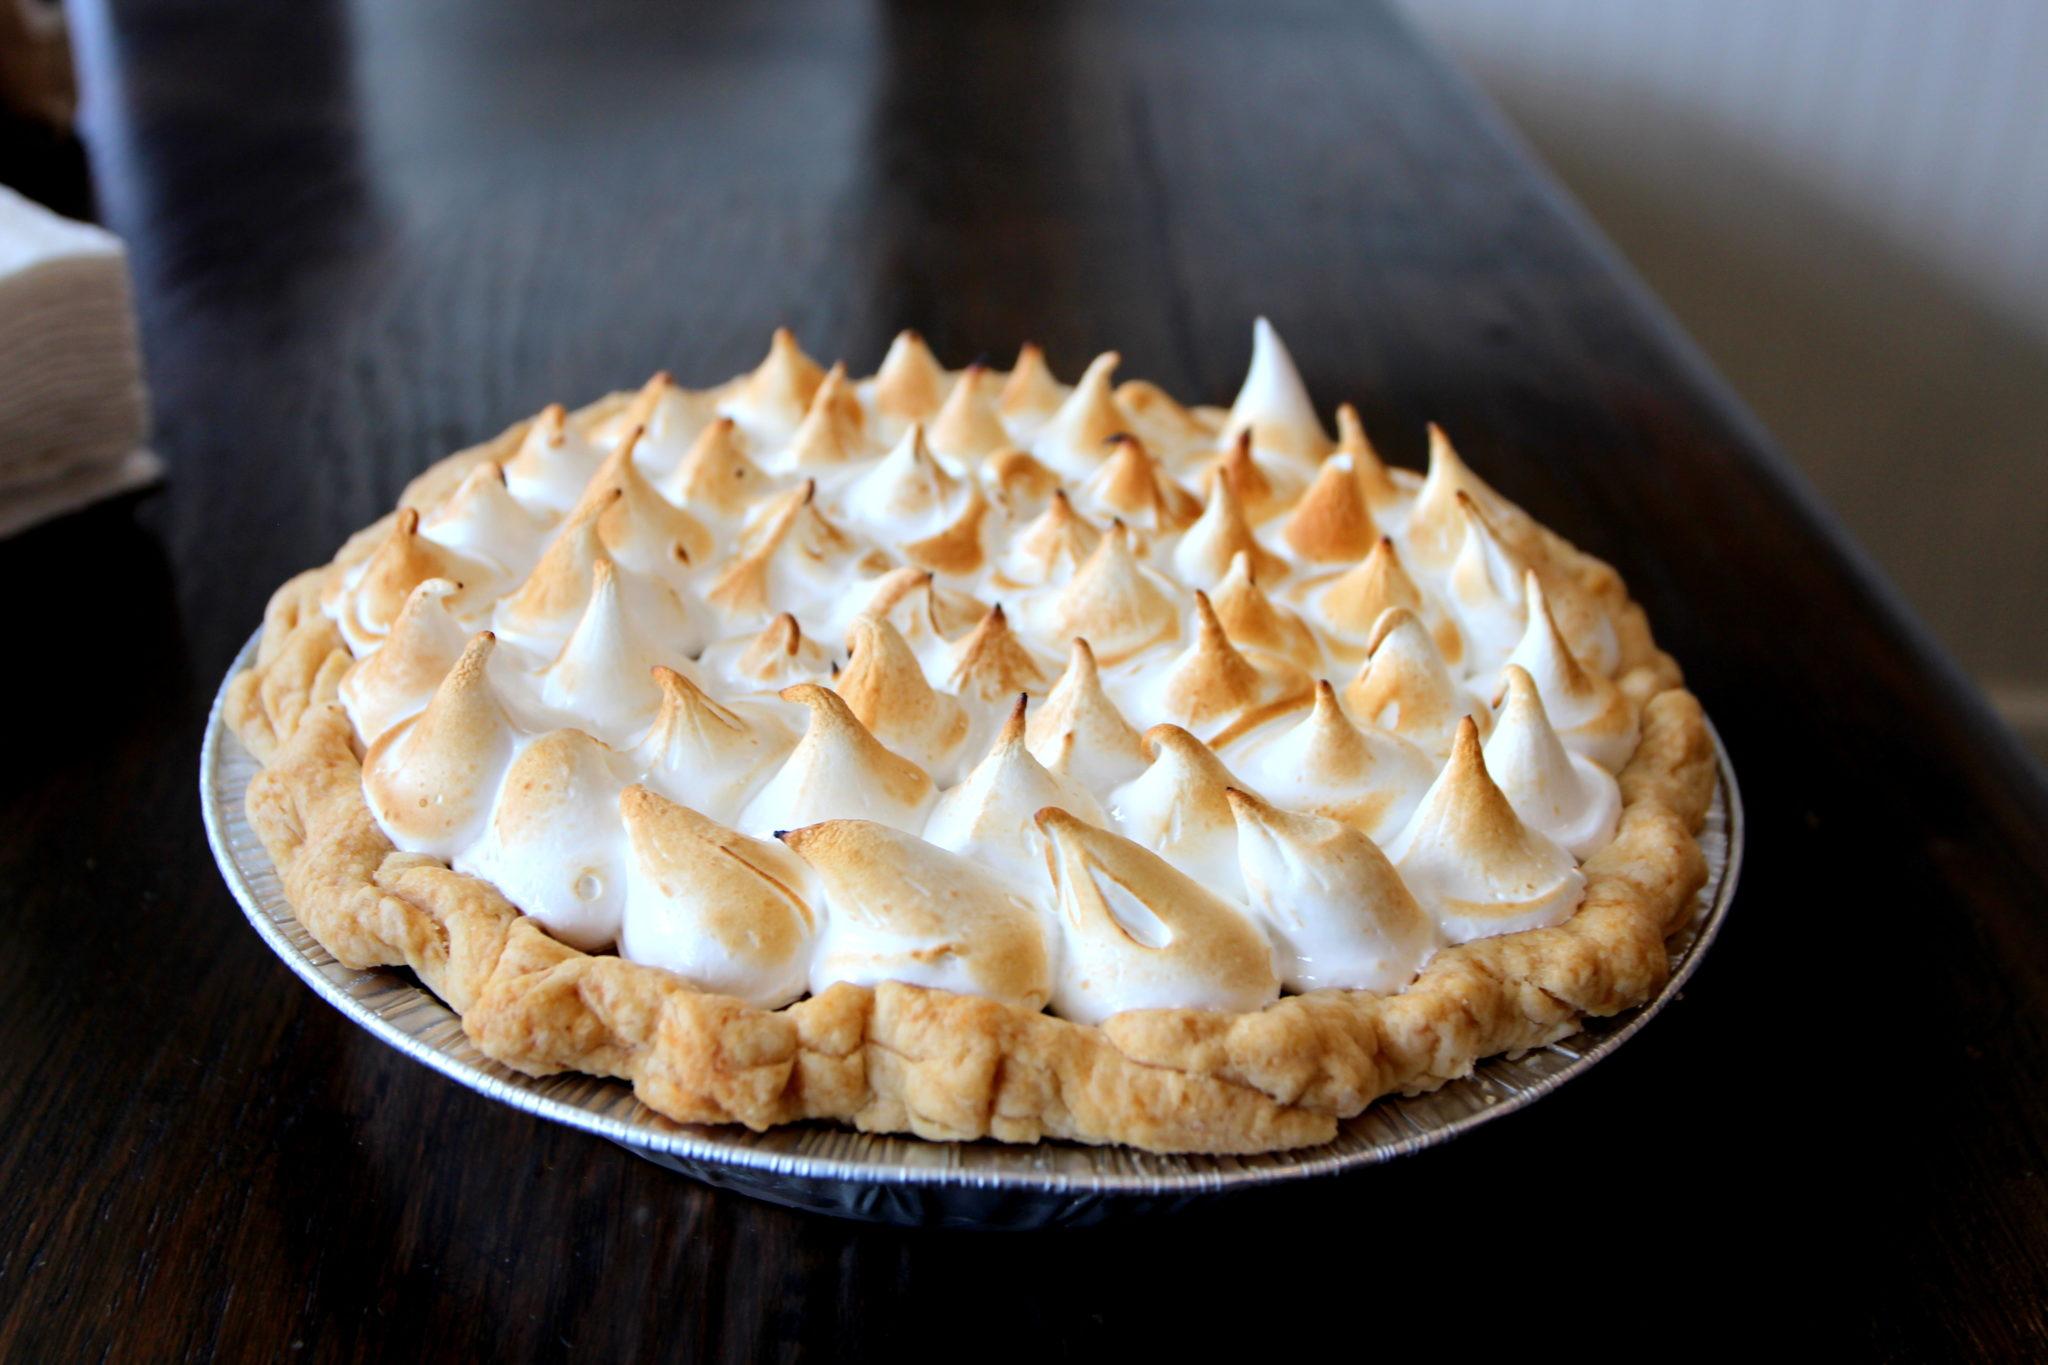 little-rock-honey-pies-sweet-potato-pie-by-kat-robinson.jpg